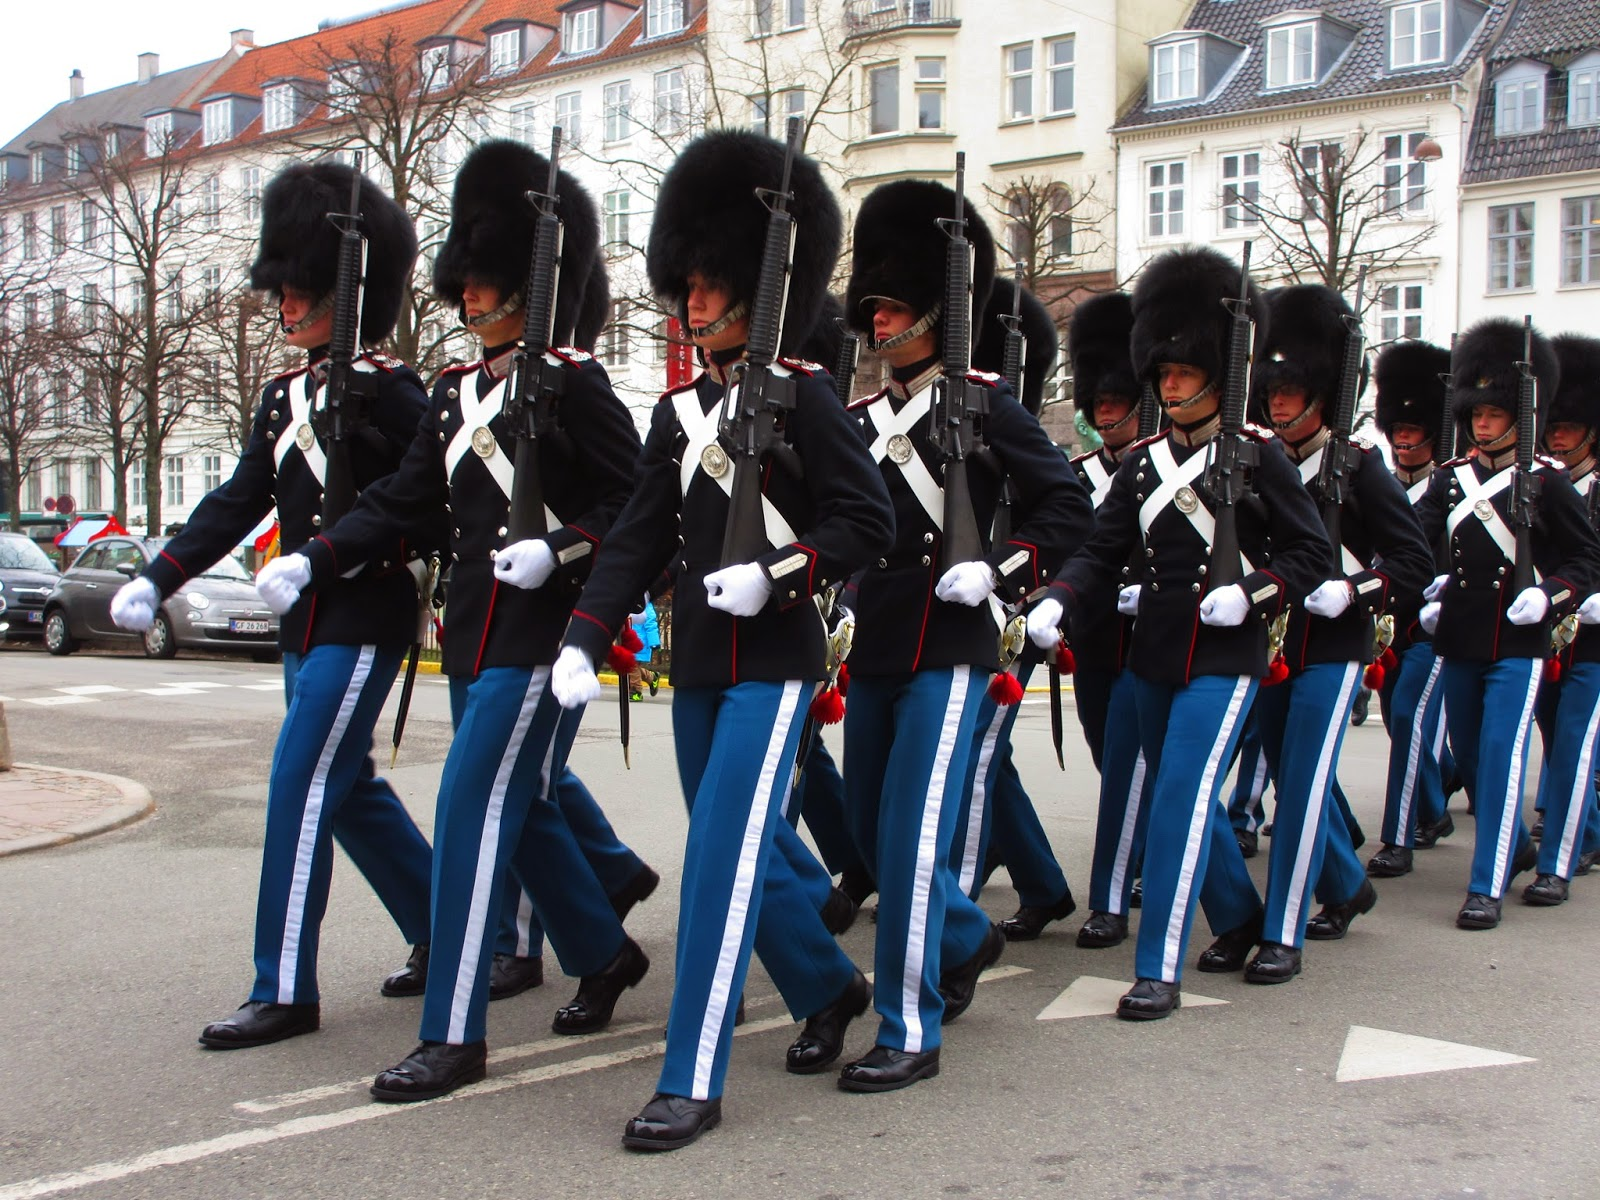 Palácio de AMALIENBORG, os soldadinhos de chumbo de Copenhaga | Dinamarca